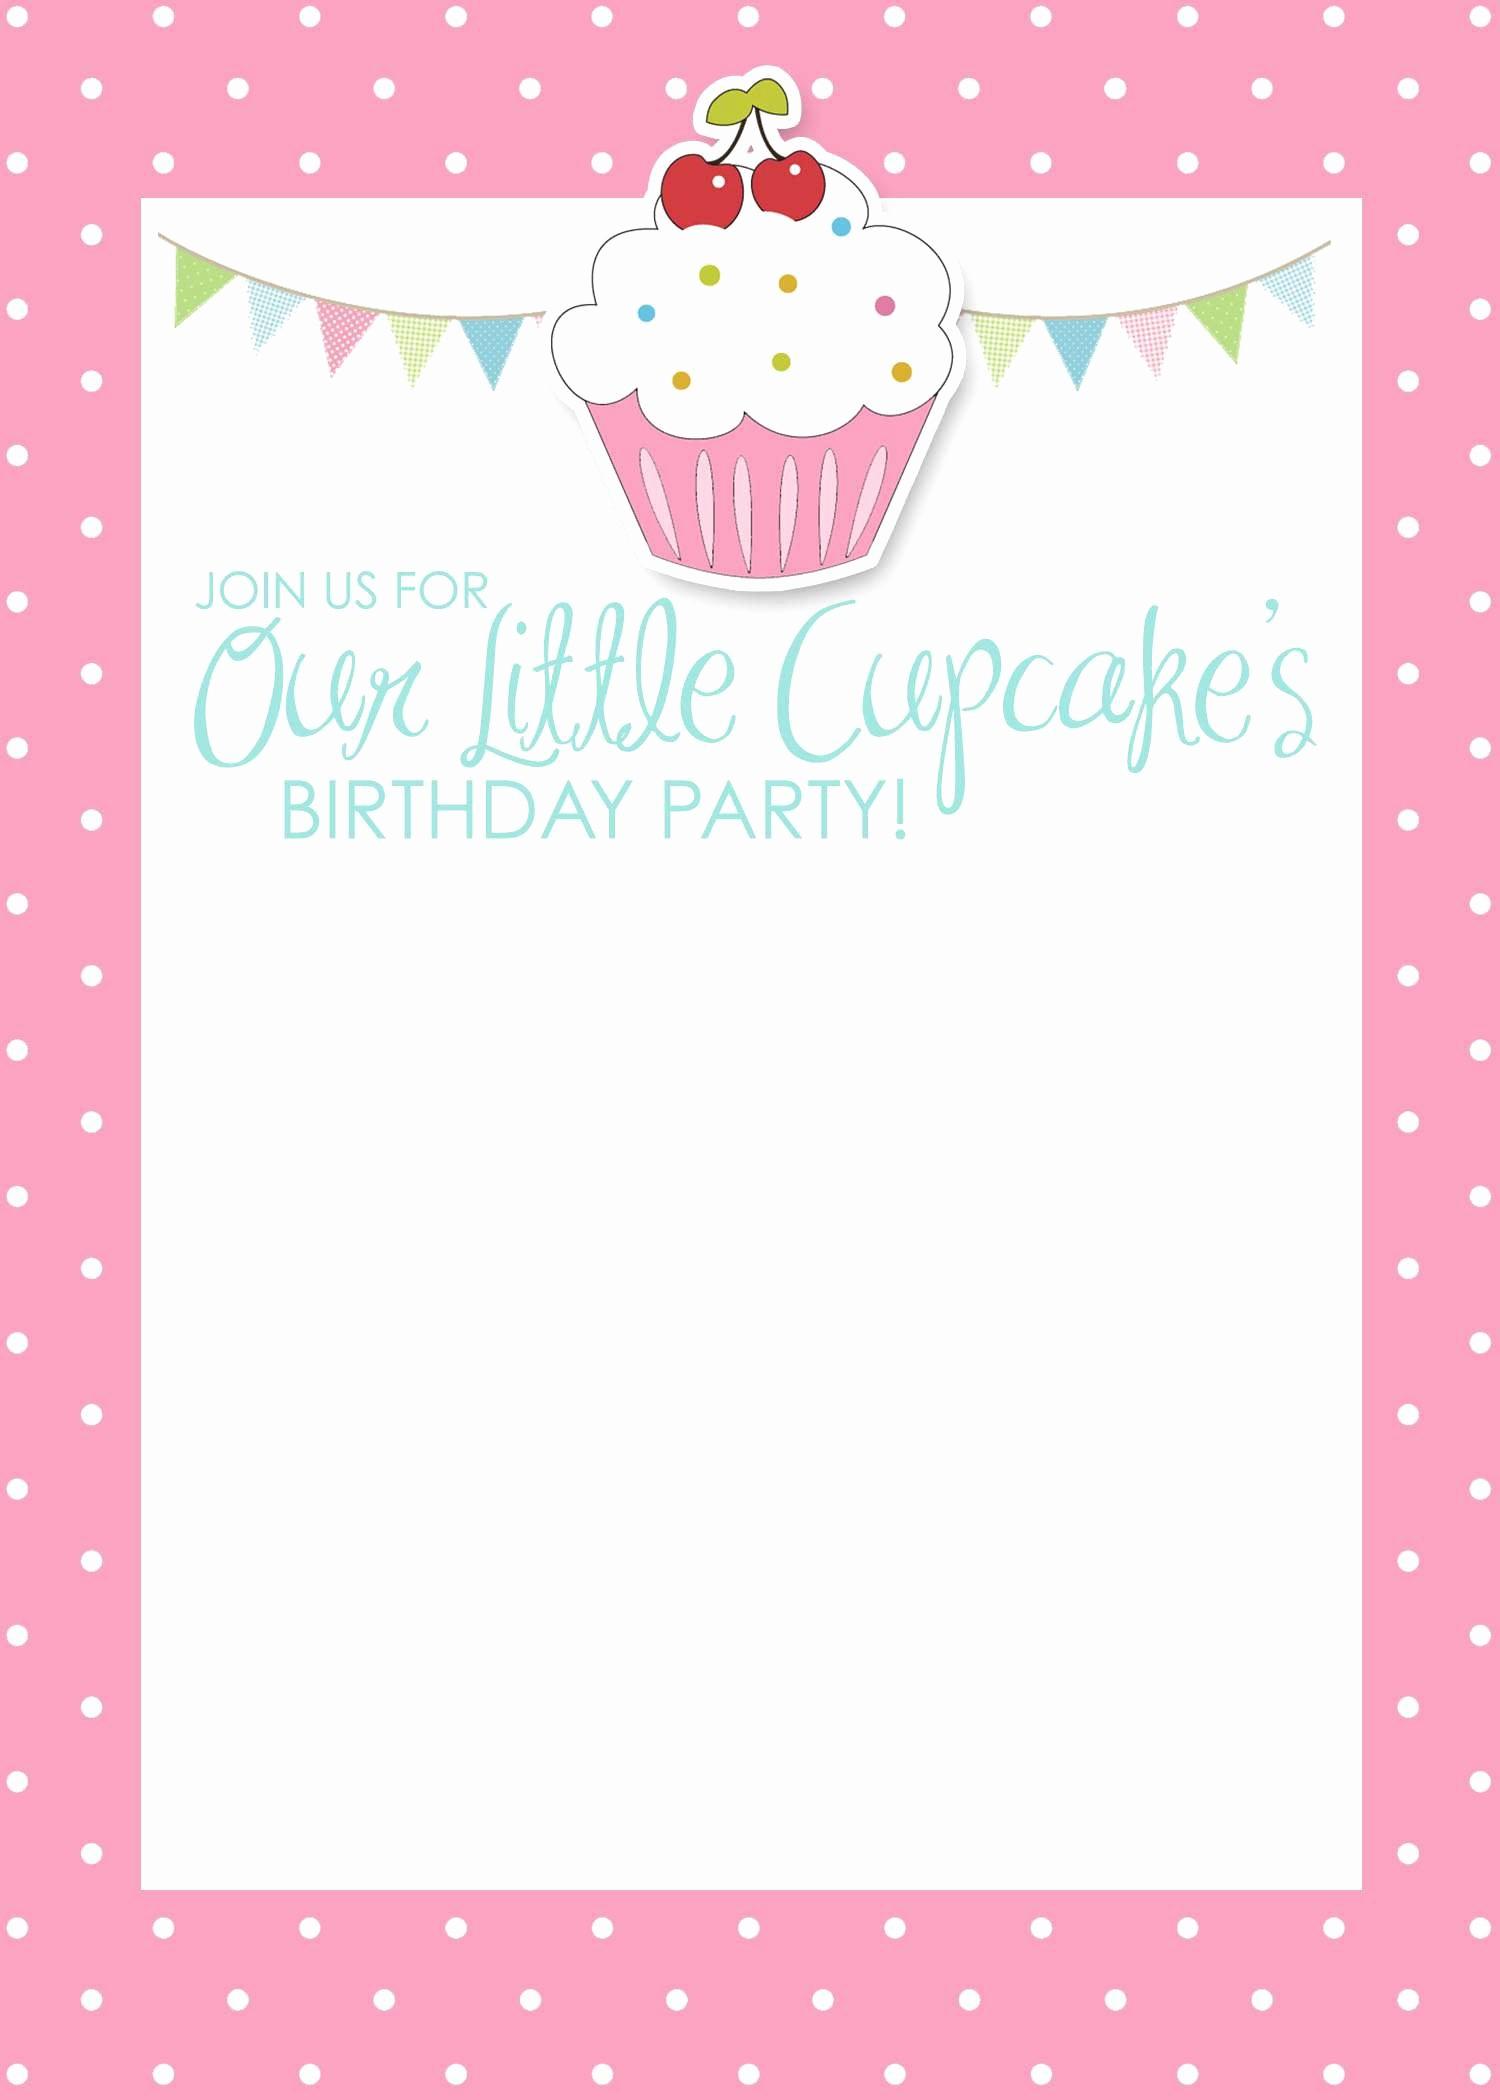 Birthday Party Invitation Card Template Luxury Birthday Invitation Card Template Birthday Invitation